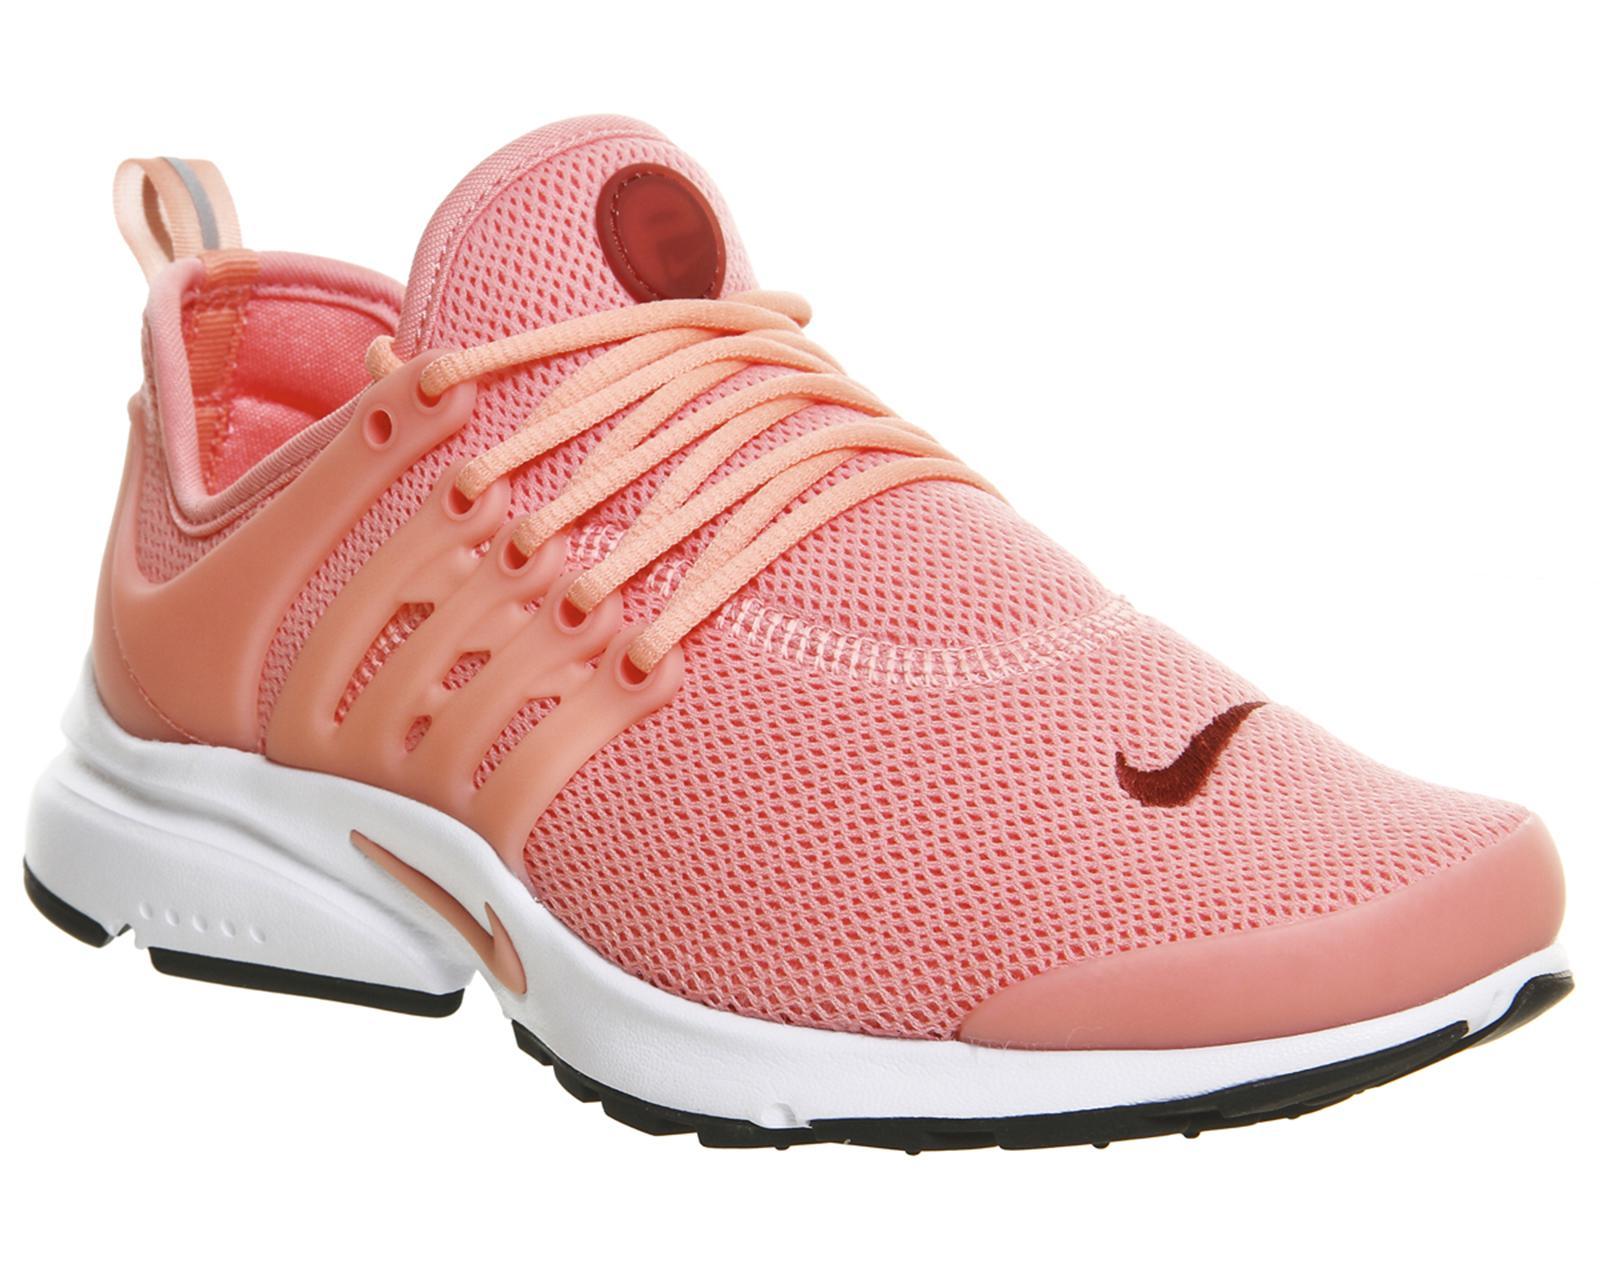 best service 83719 13340 Lyst - Nike Air Presto in Pink